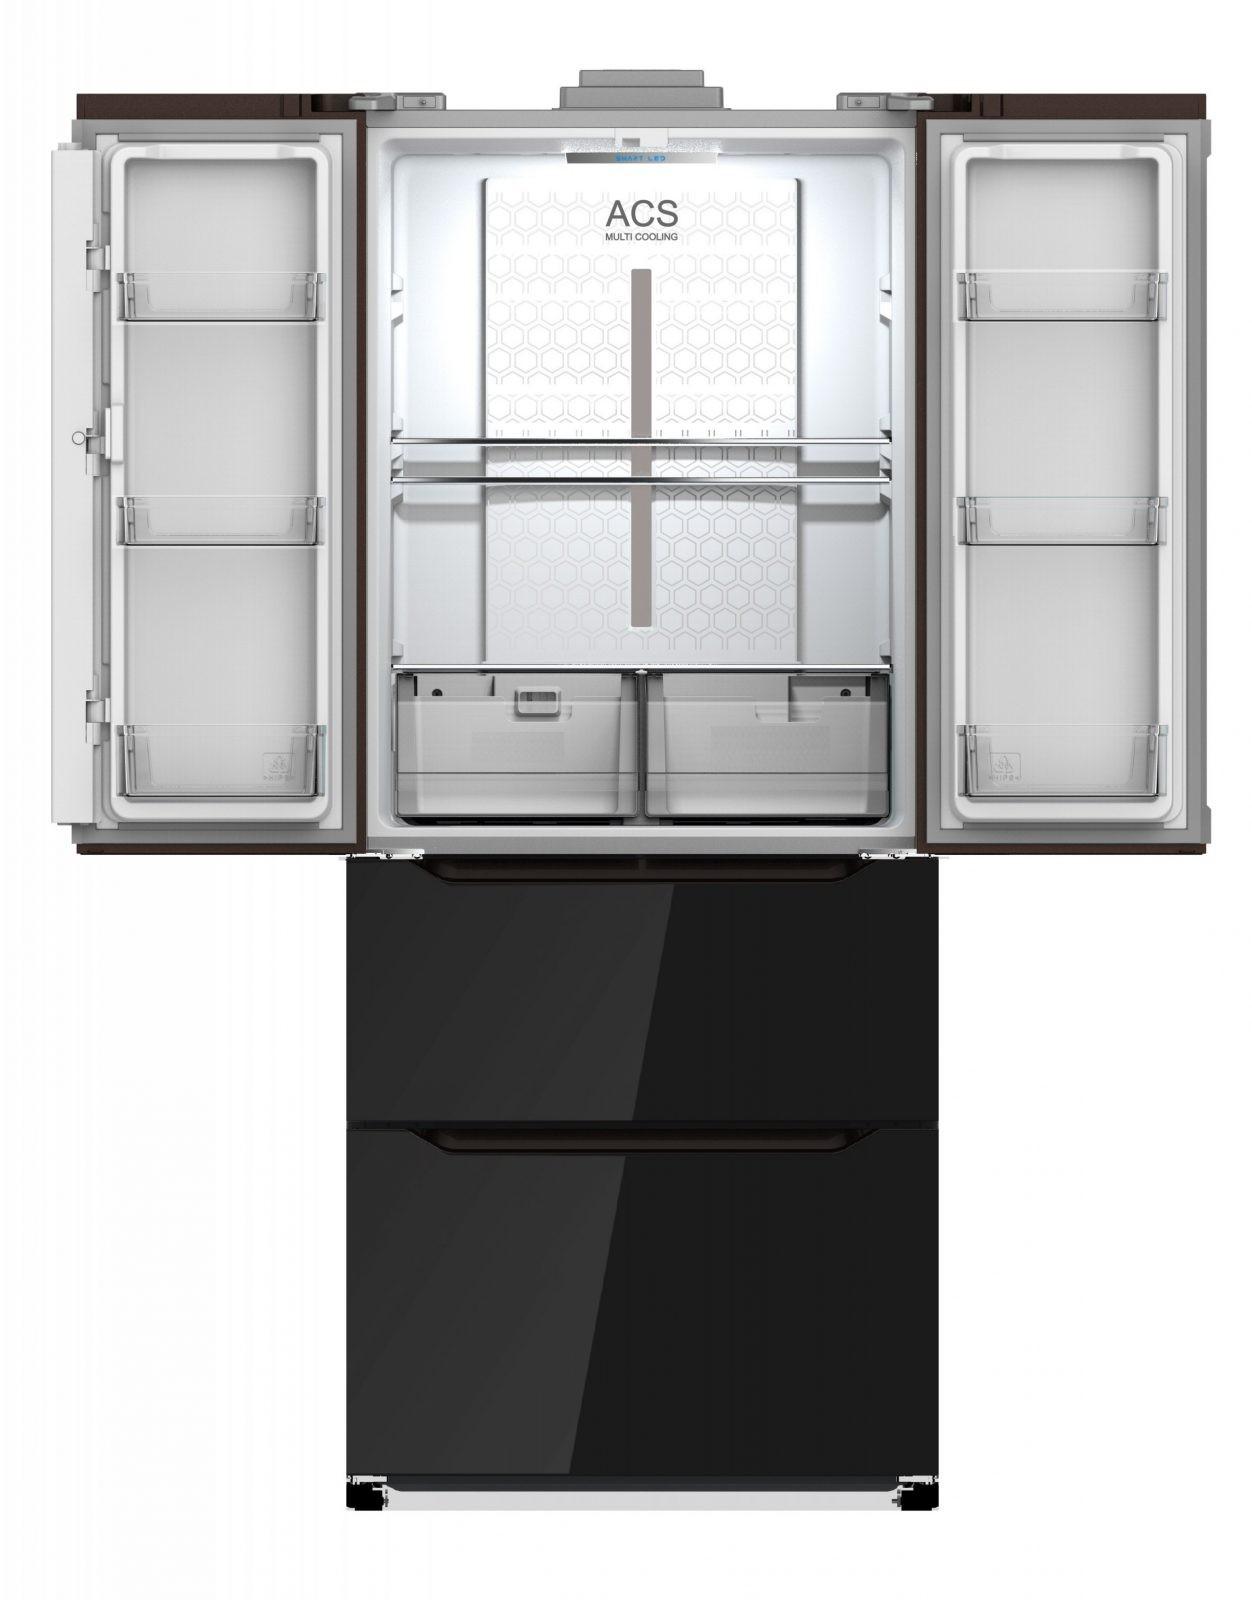 Kühlgefrierkombinationen  Standgeräte  Kühlen  Gefrieren von Kühl Gefrierkombination Mit 0 Grad Zone Bild